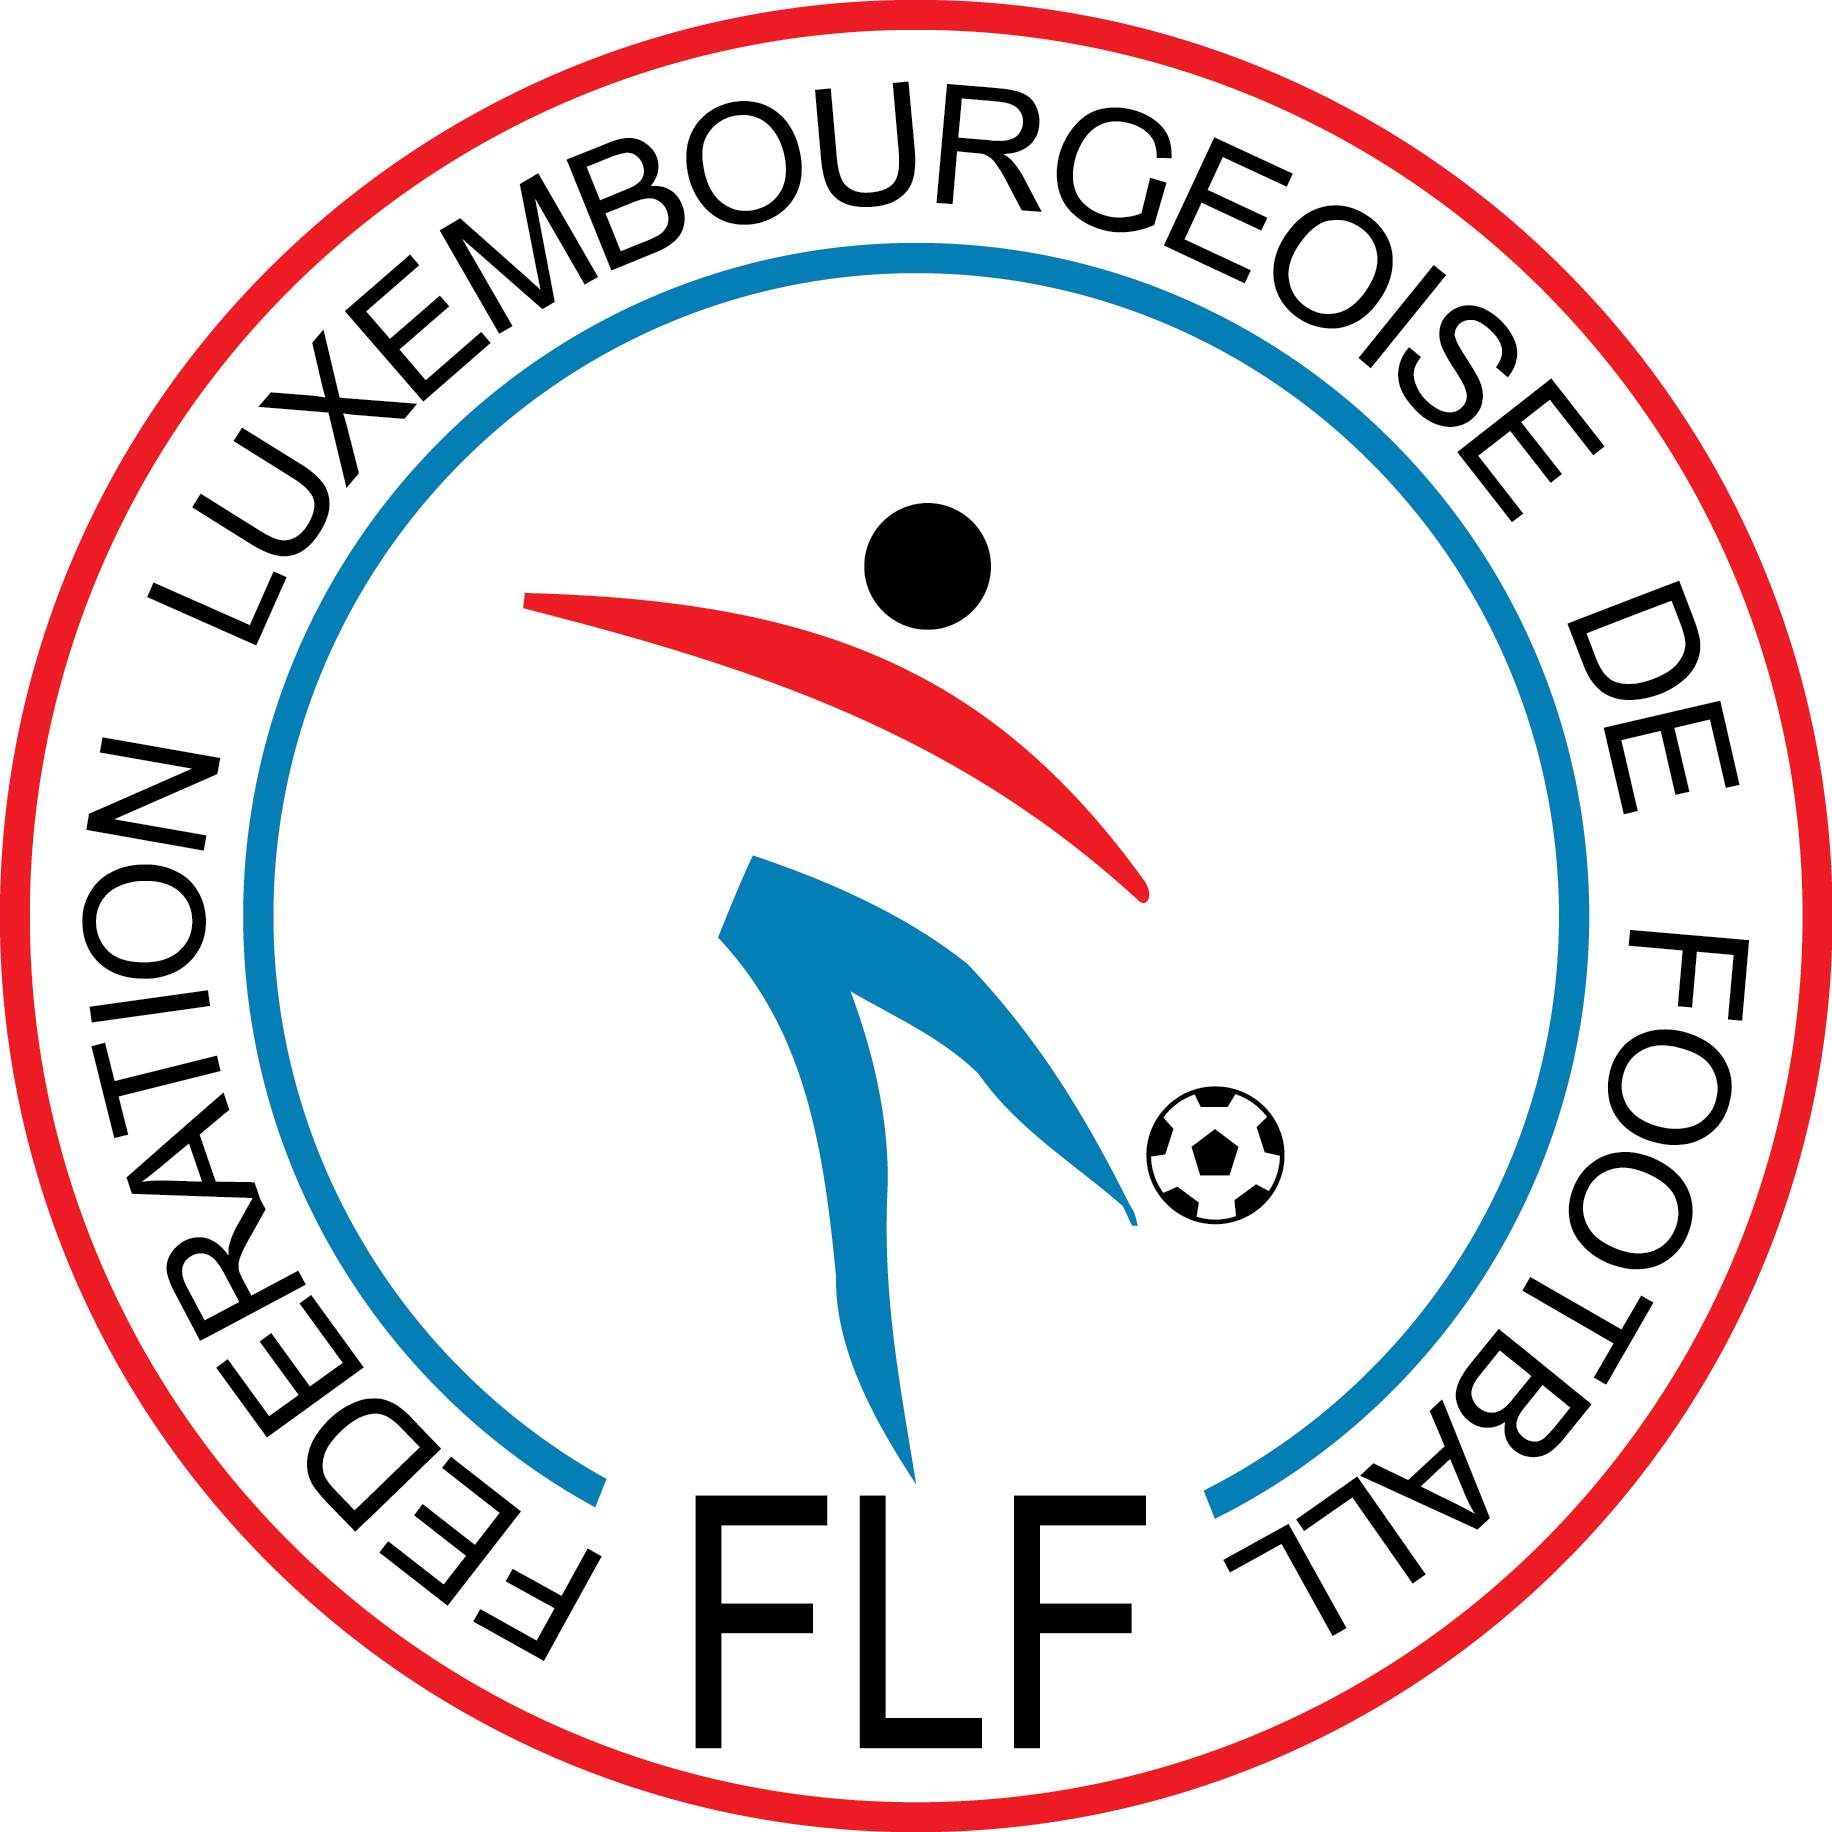 Jong Luxemburg